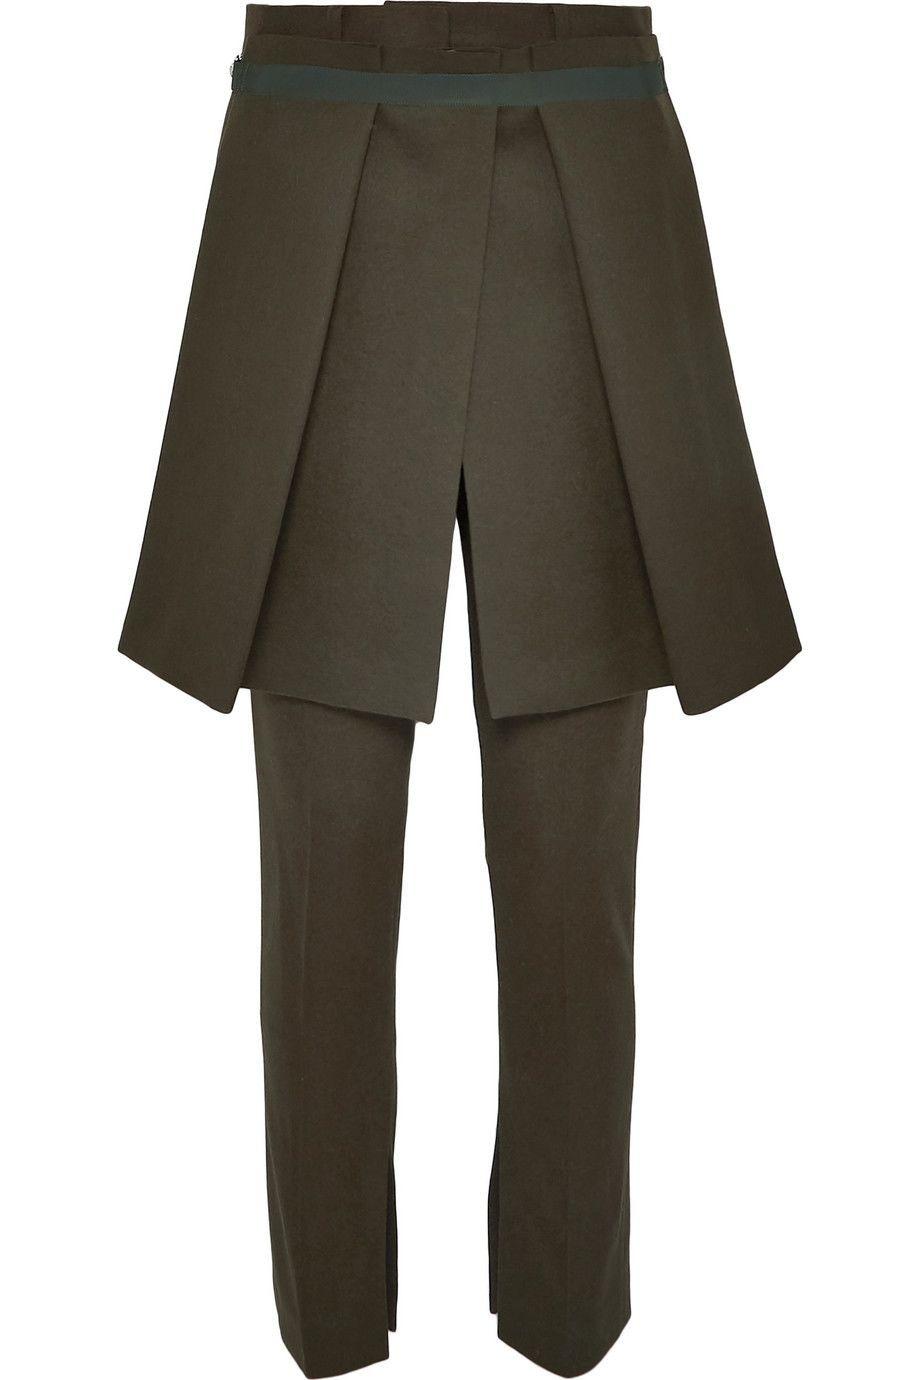 #PopbelaOOTD: Celana Kantor Modis!